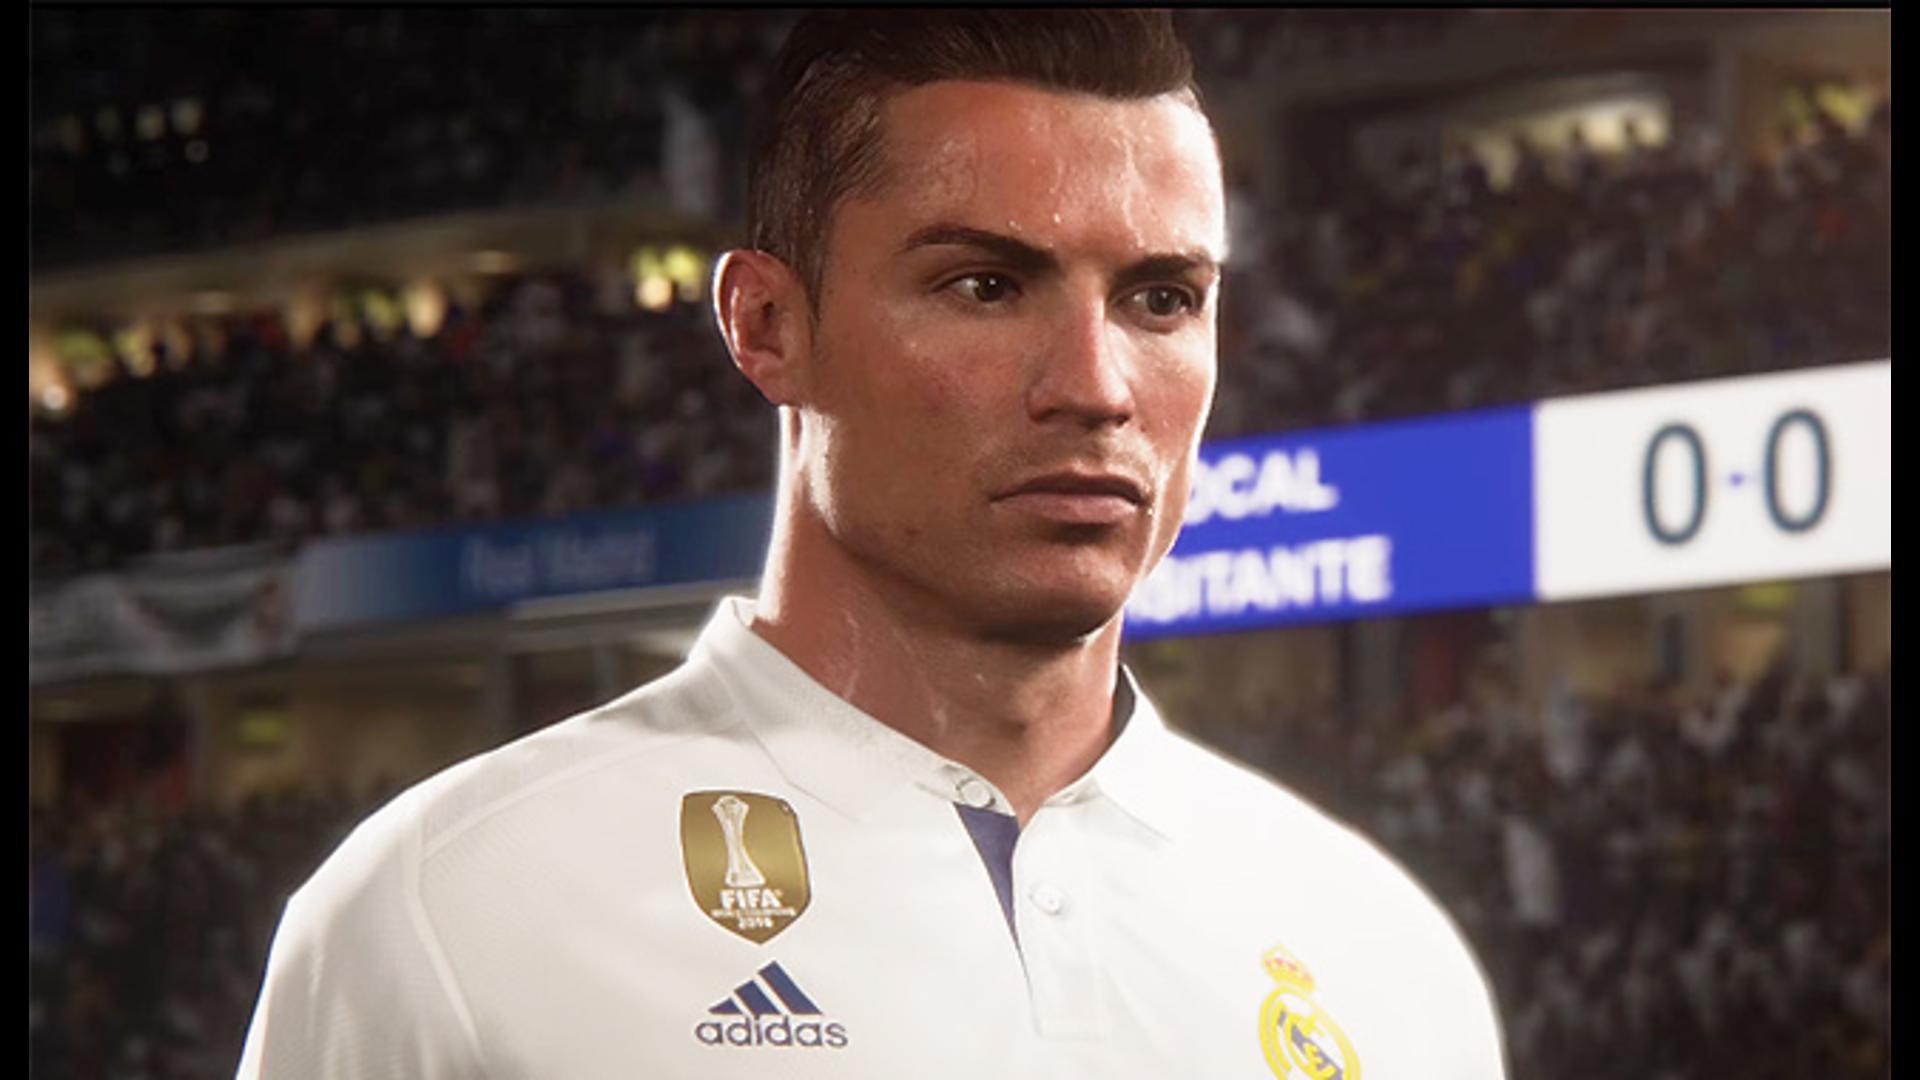 FIFA 18 Reveal Trailer -- Ronaldo screen capture